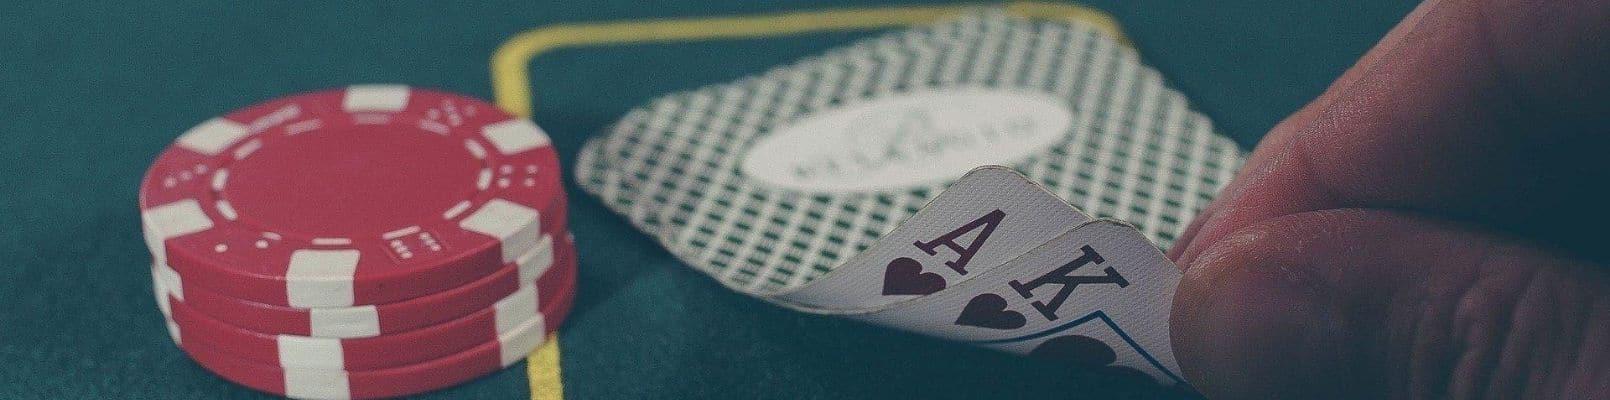 legalizare gambling